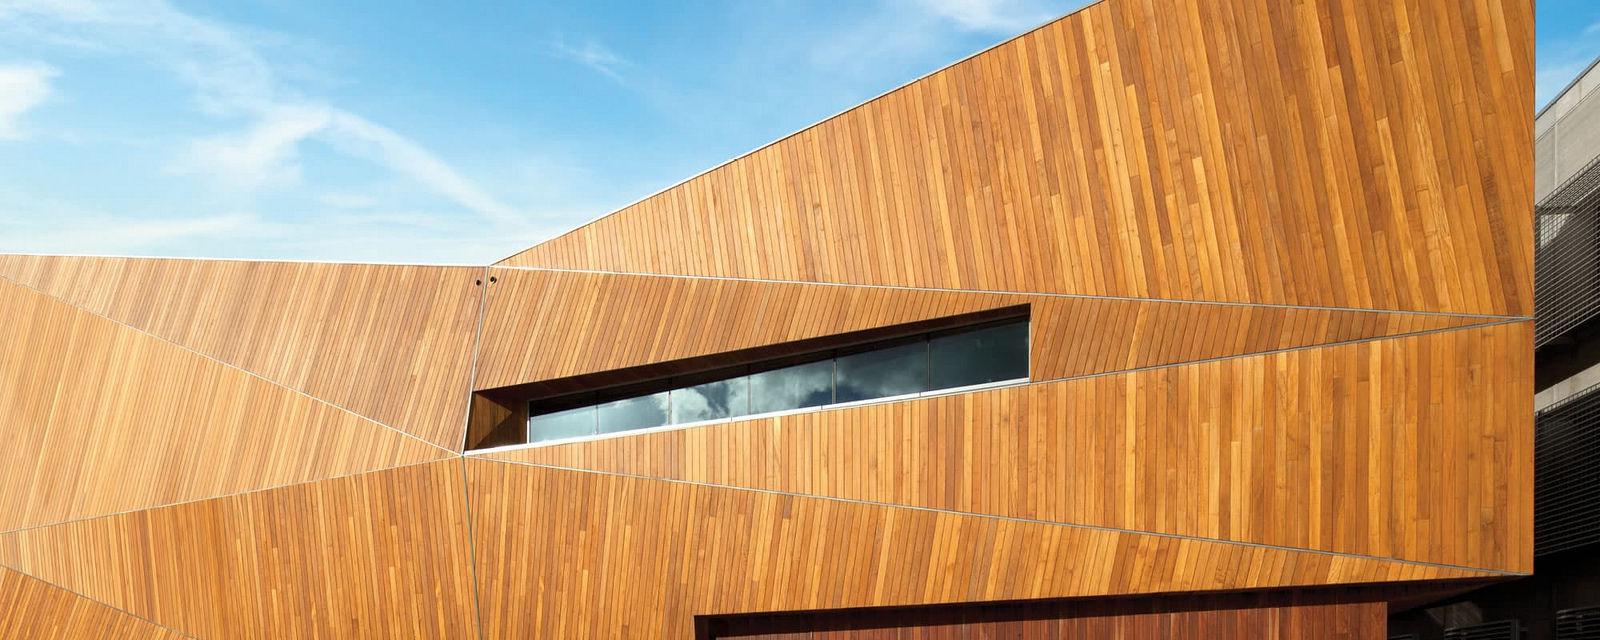 SLIDER_Architects-B_30years-min